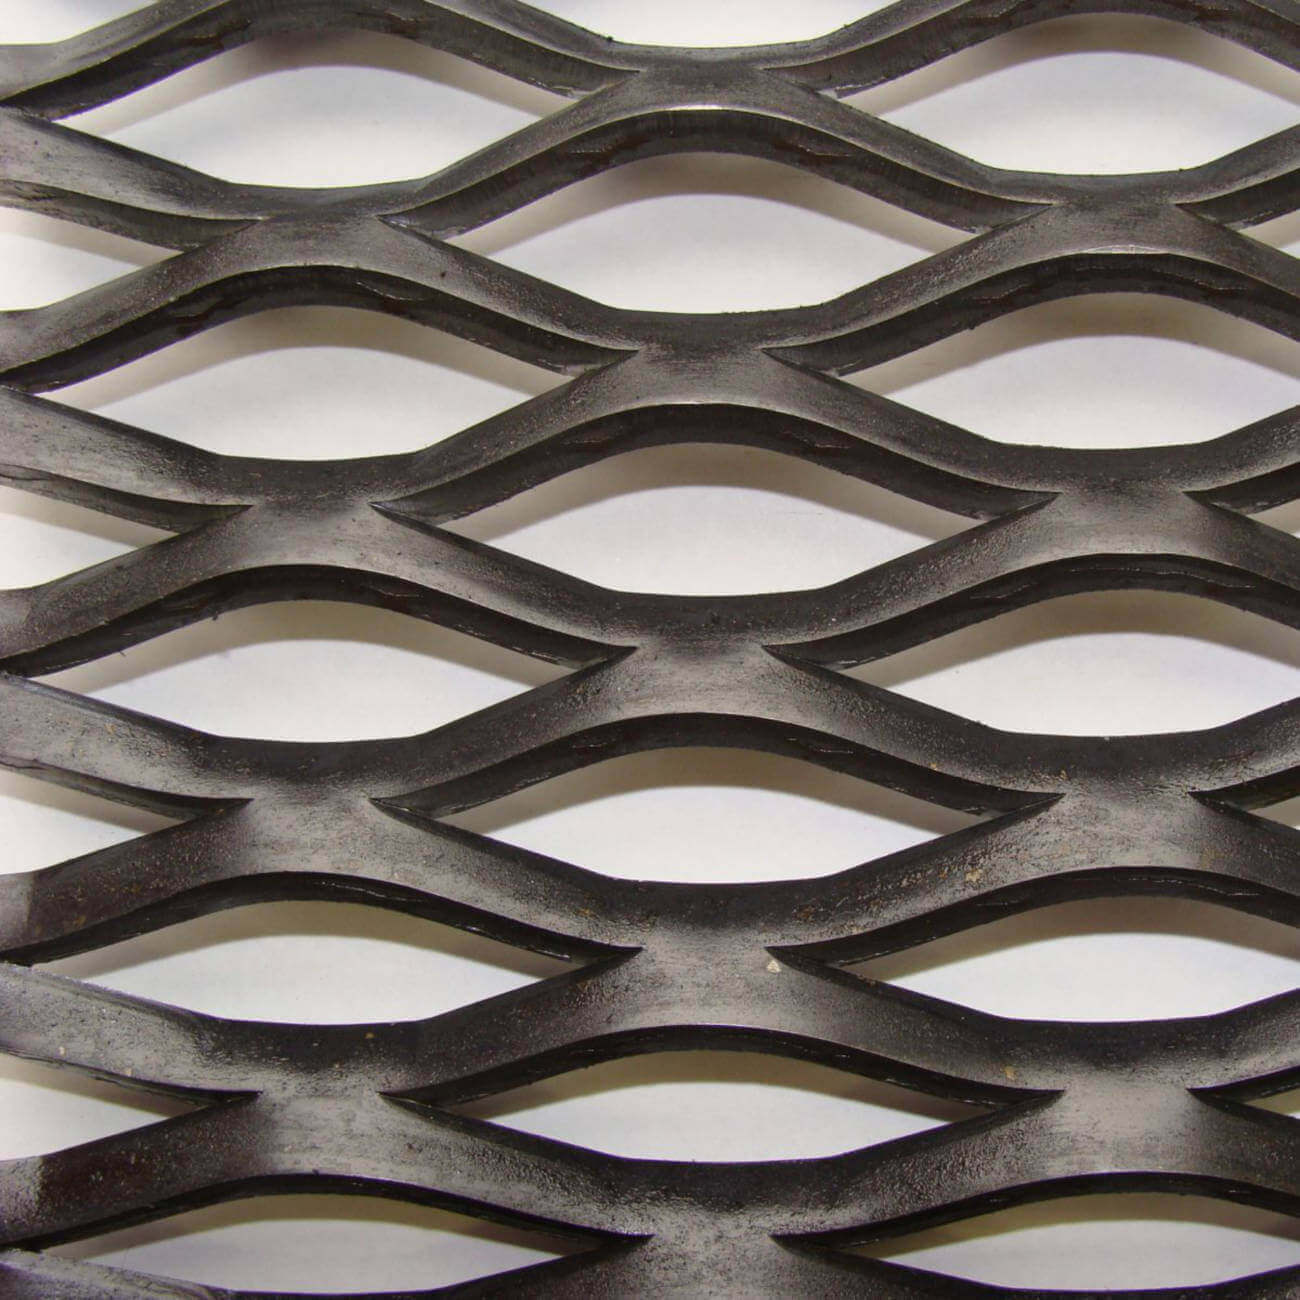 WK3022 Gridwalk Expanded Metal Sheet: 53 x 15mm Openings